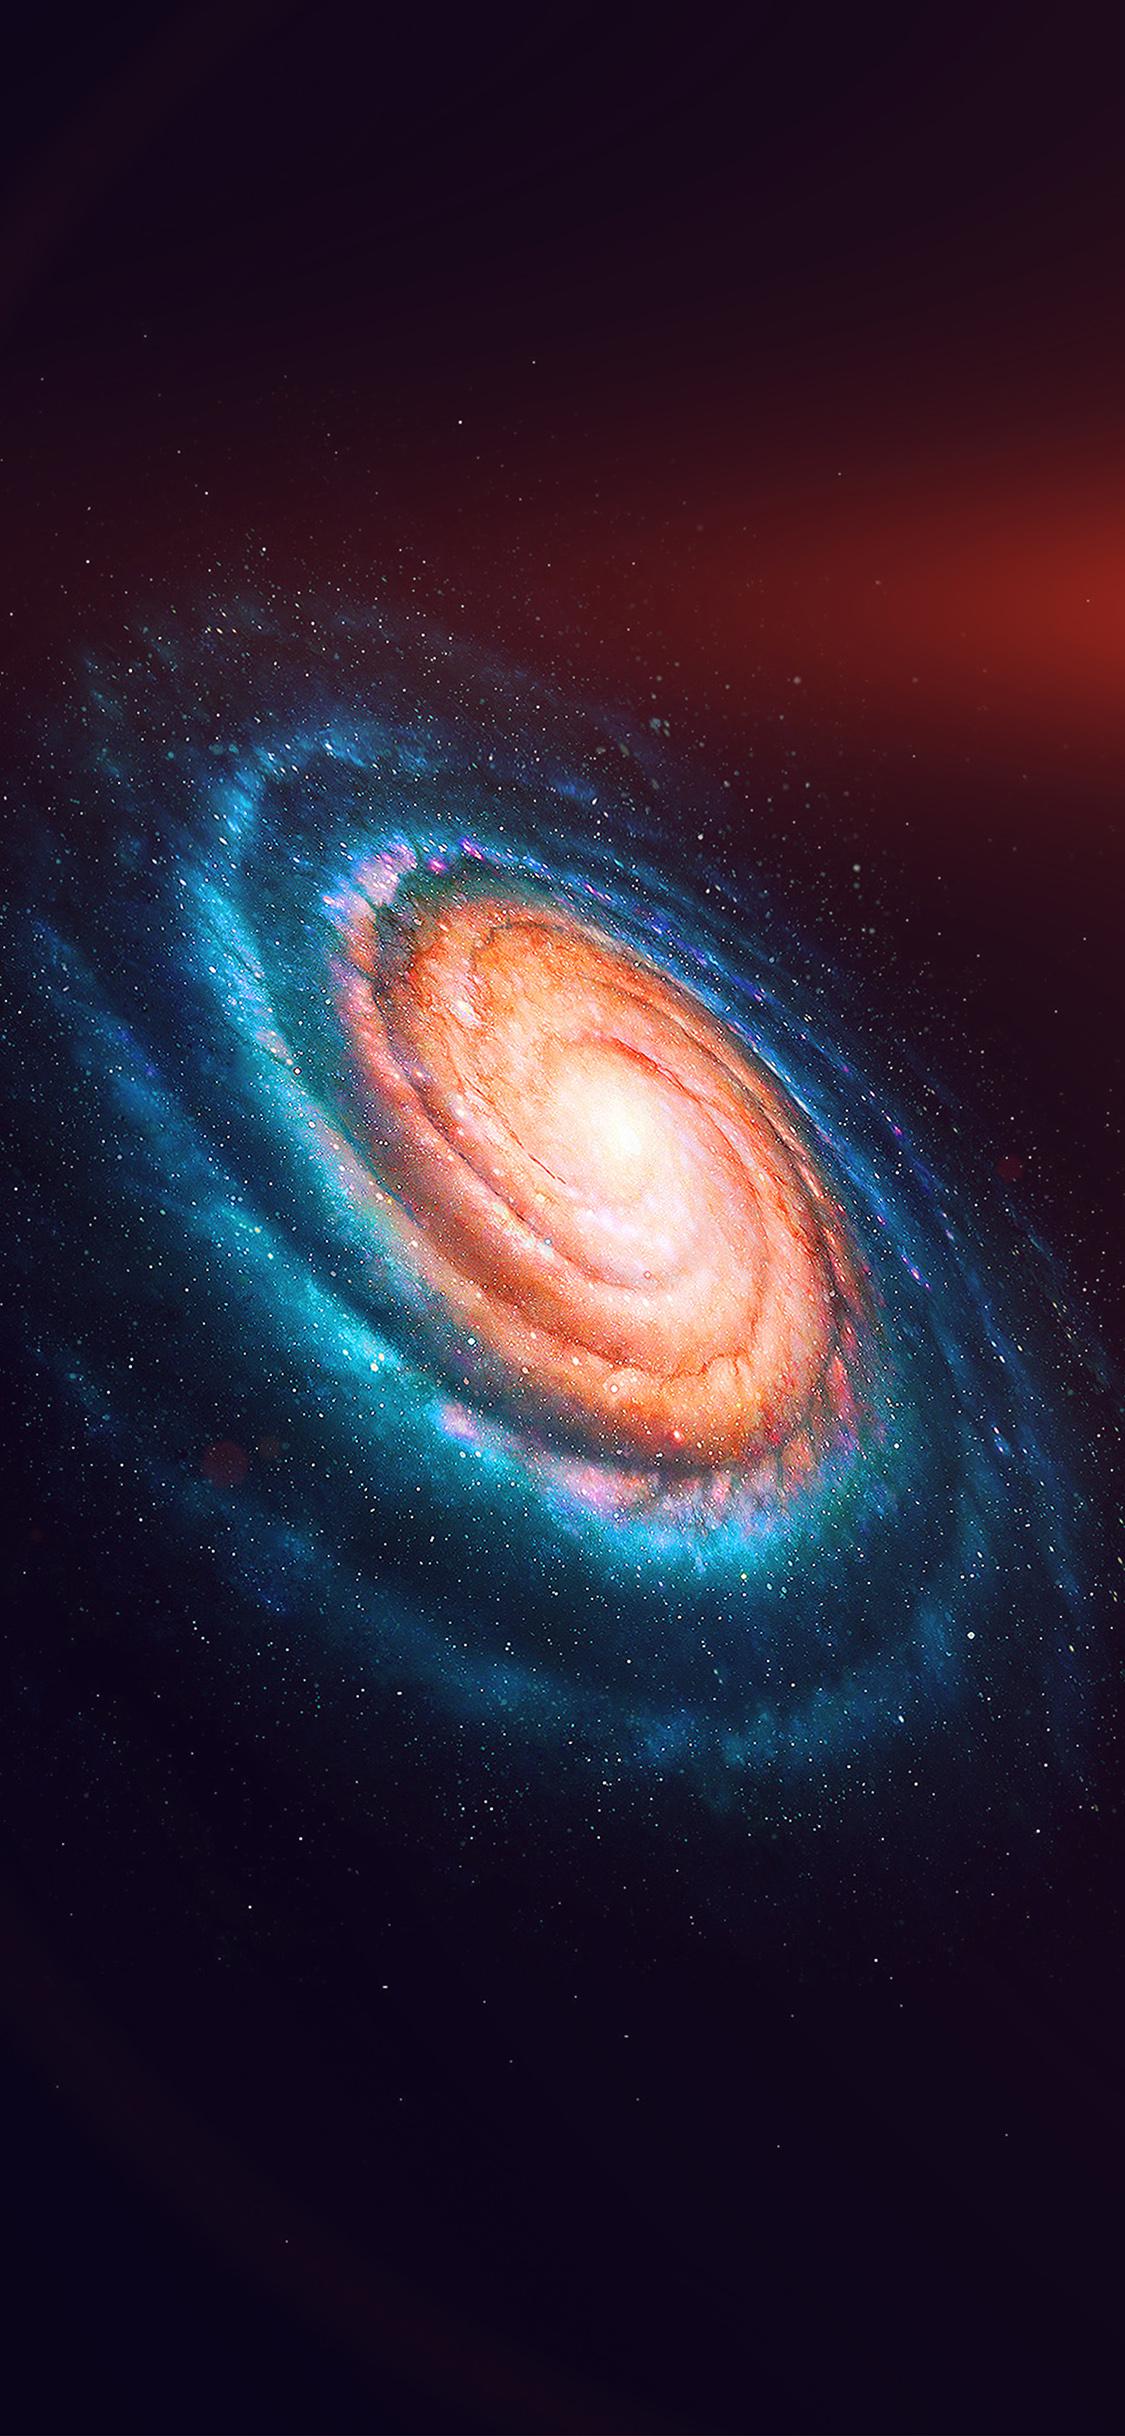 Space galaxy iphone wallpaper ilikewallpaper com